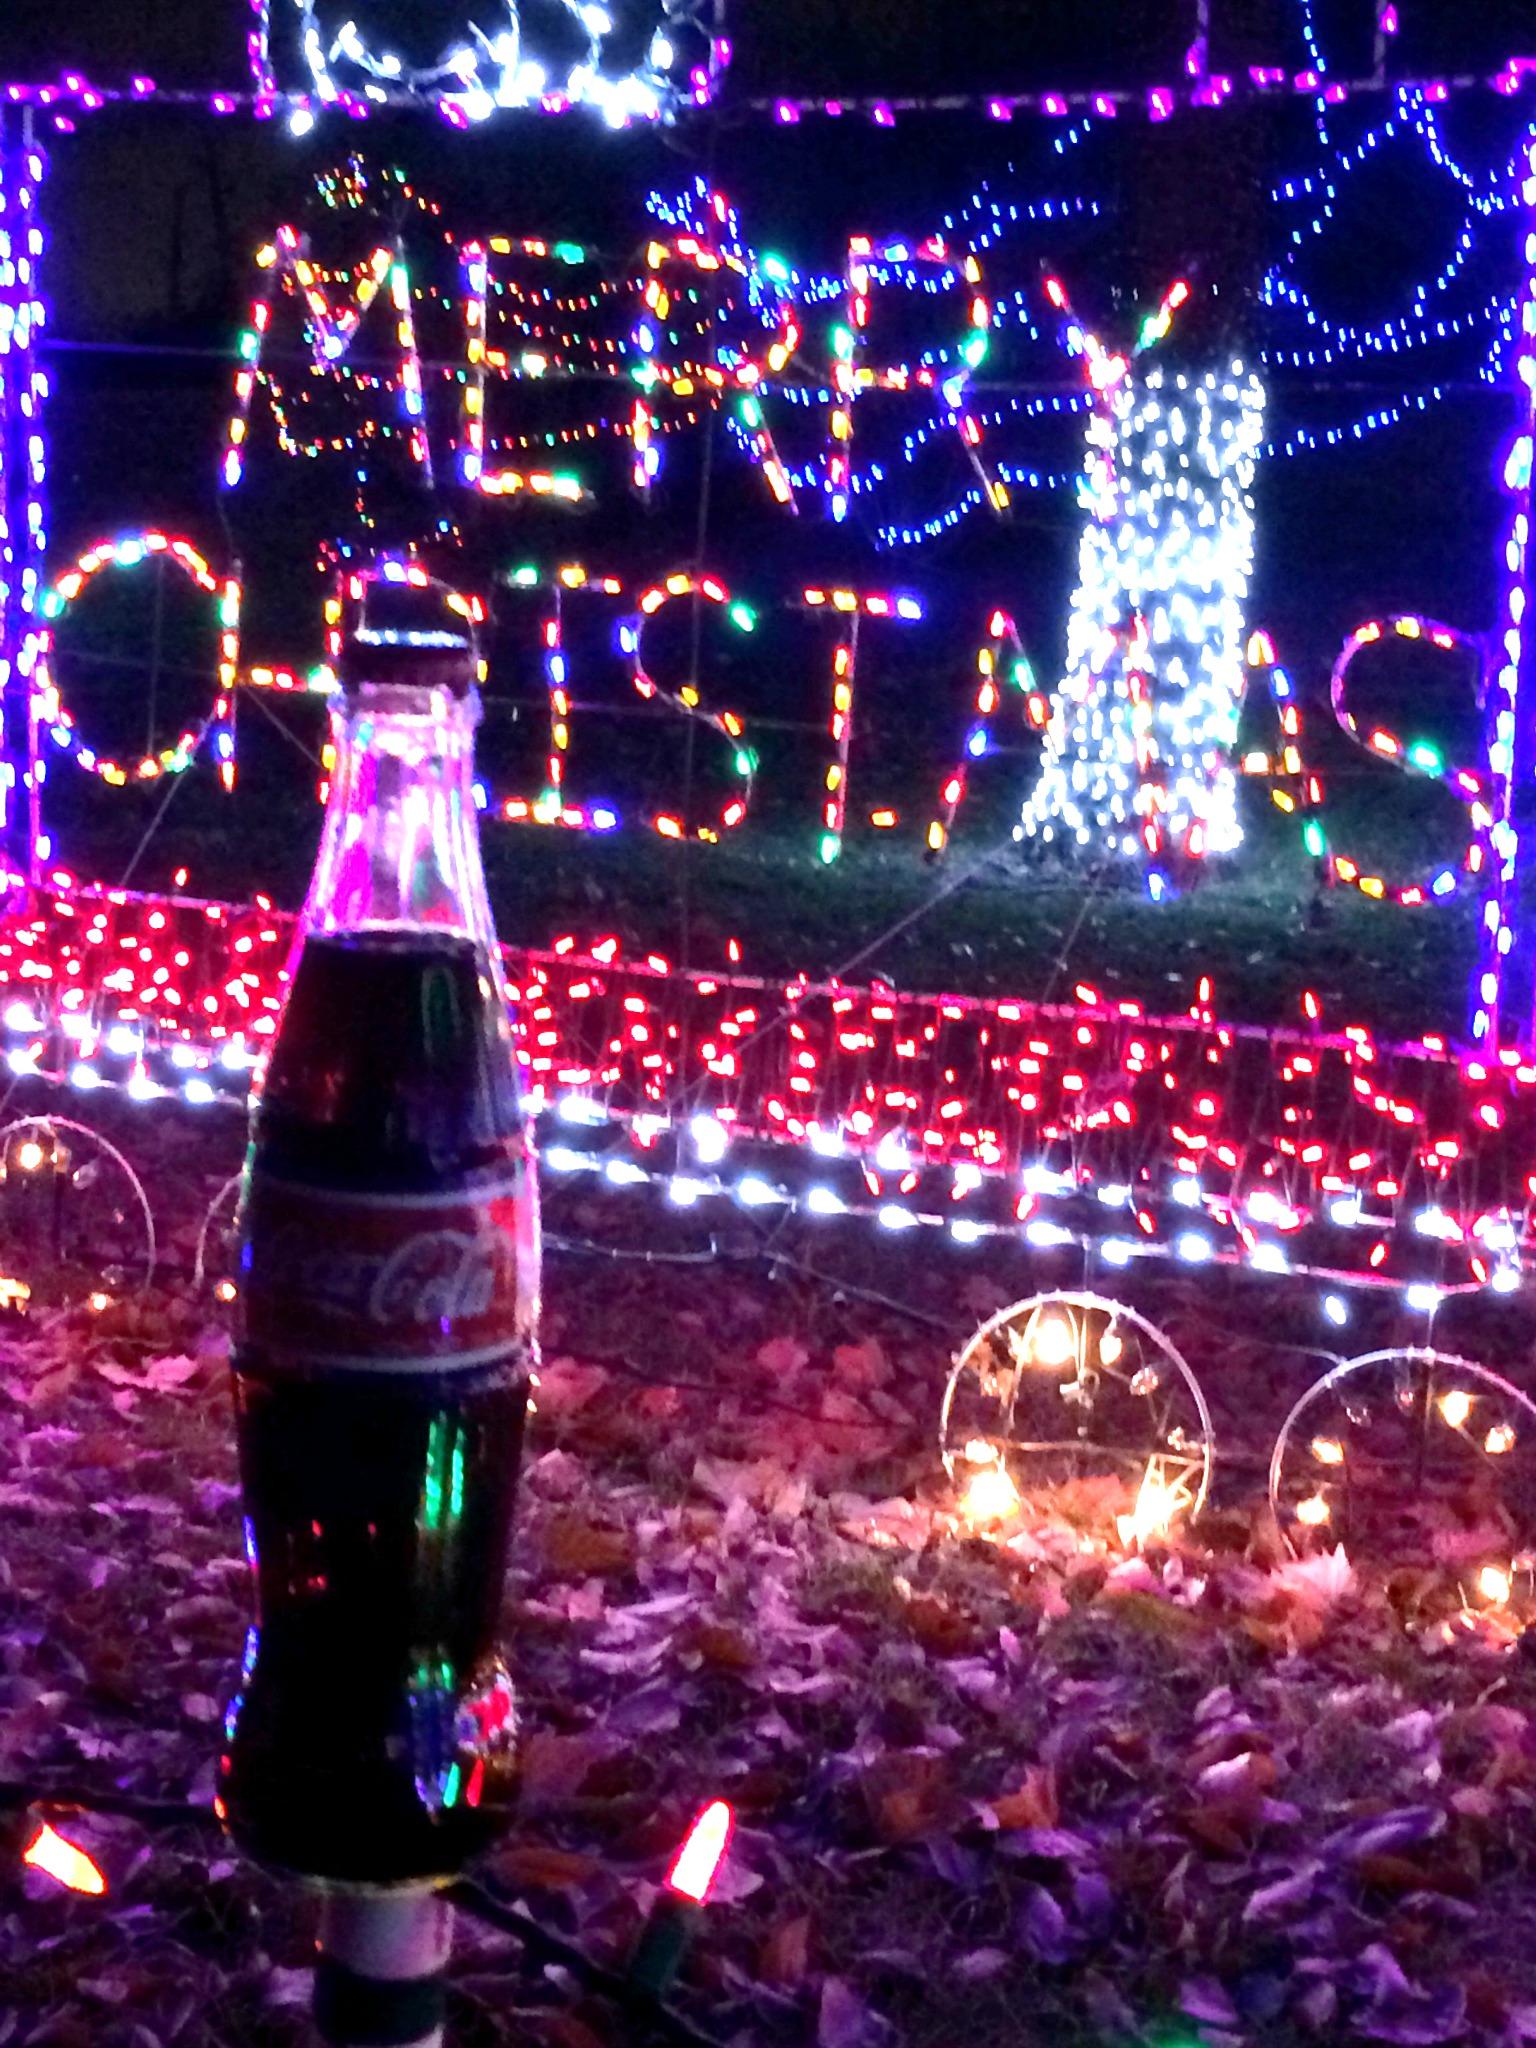 real magic-merry Christmas